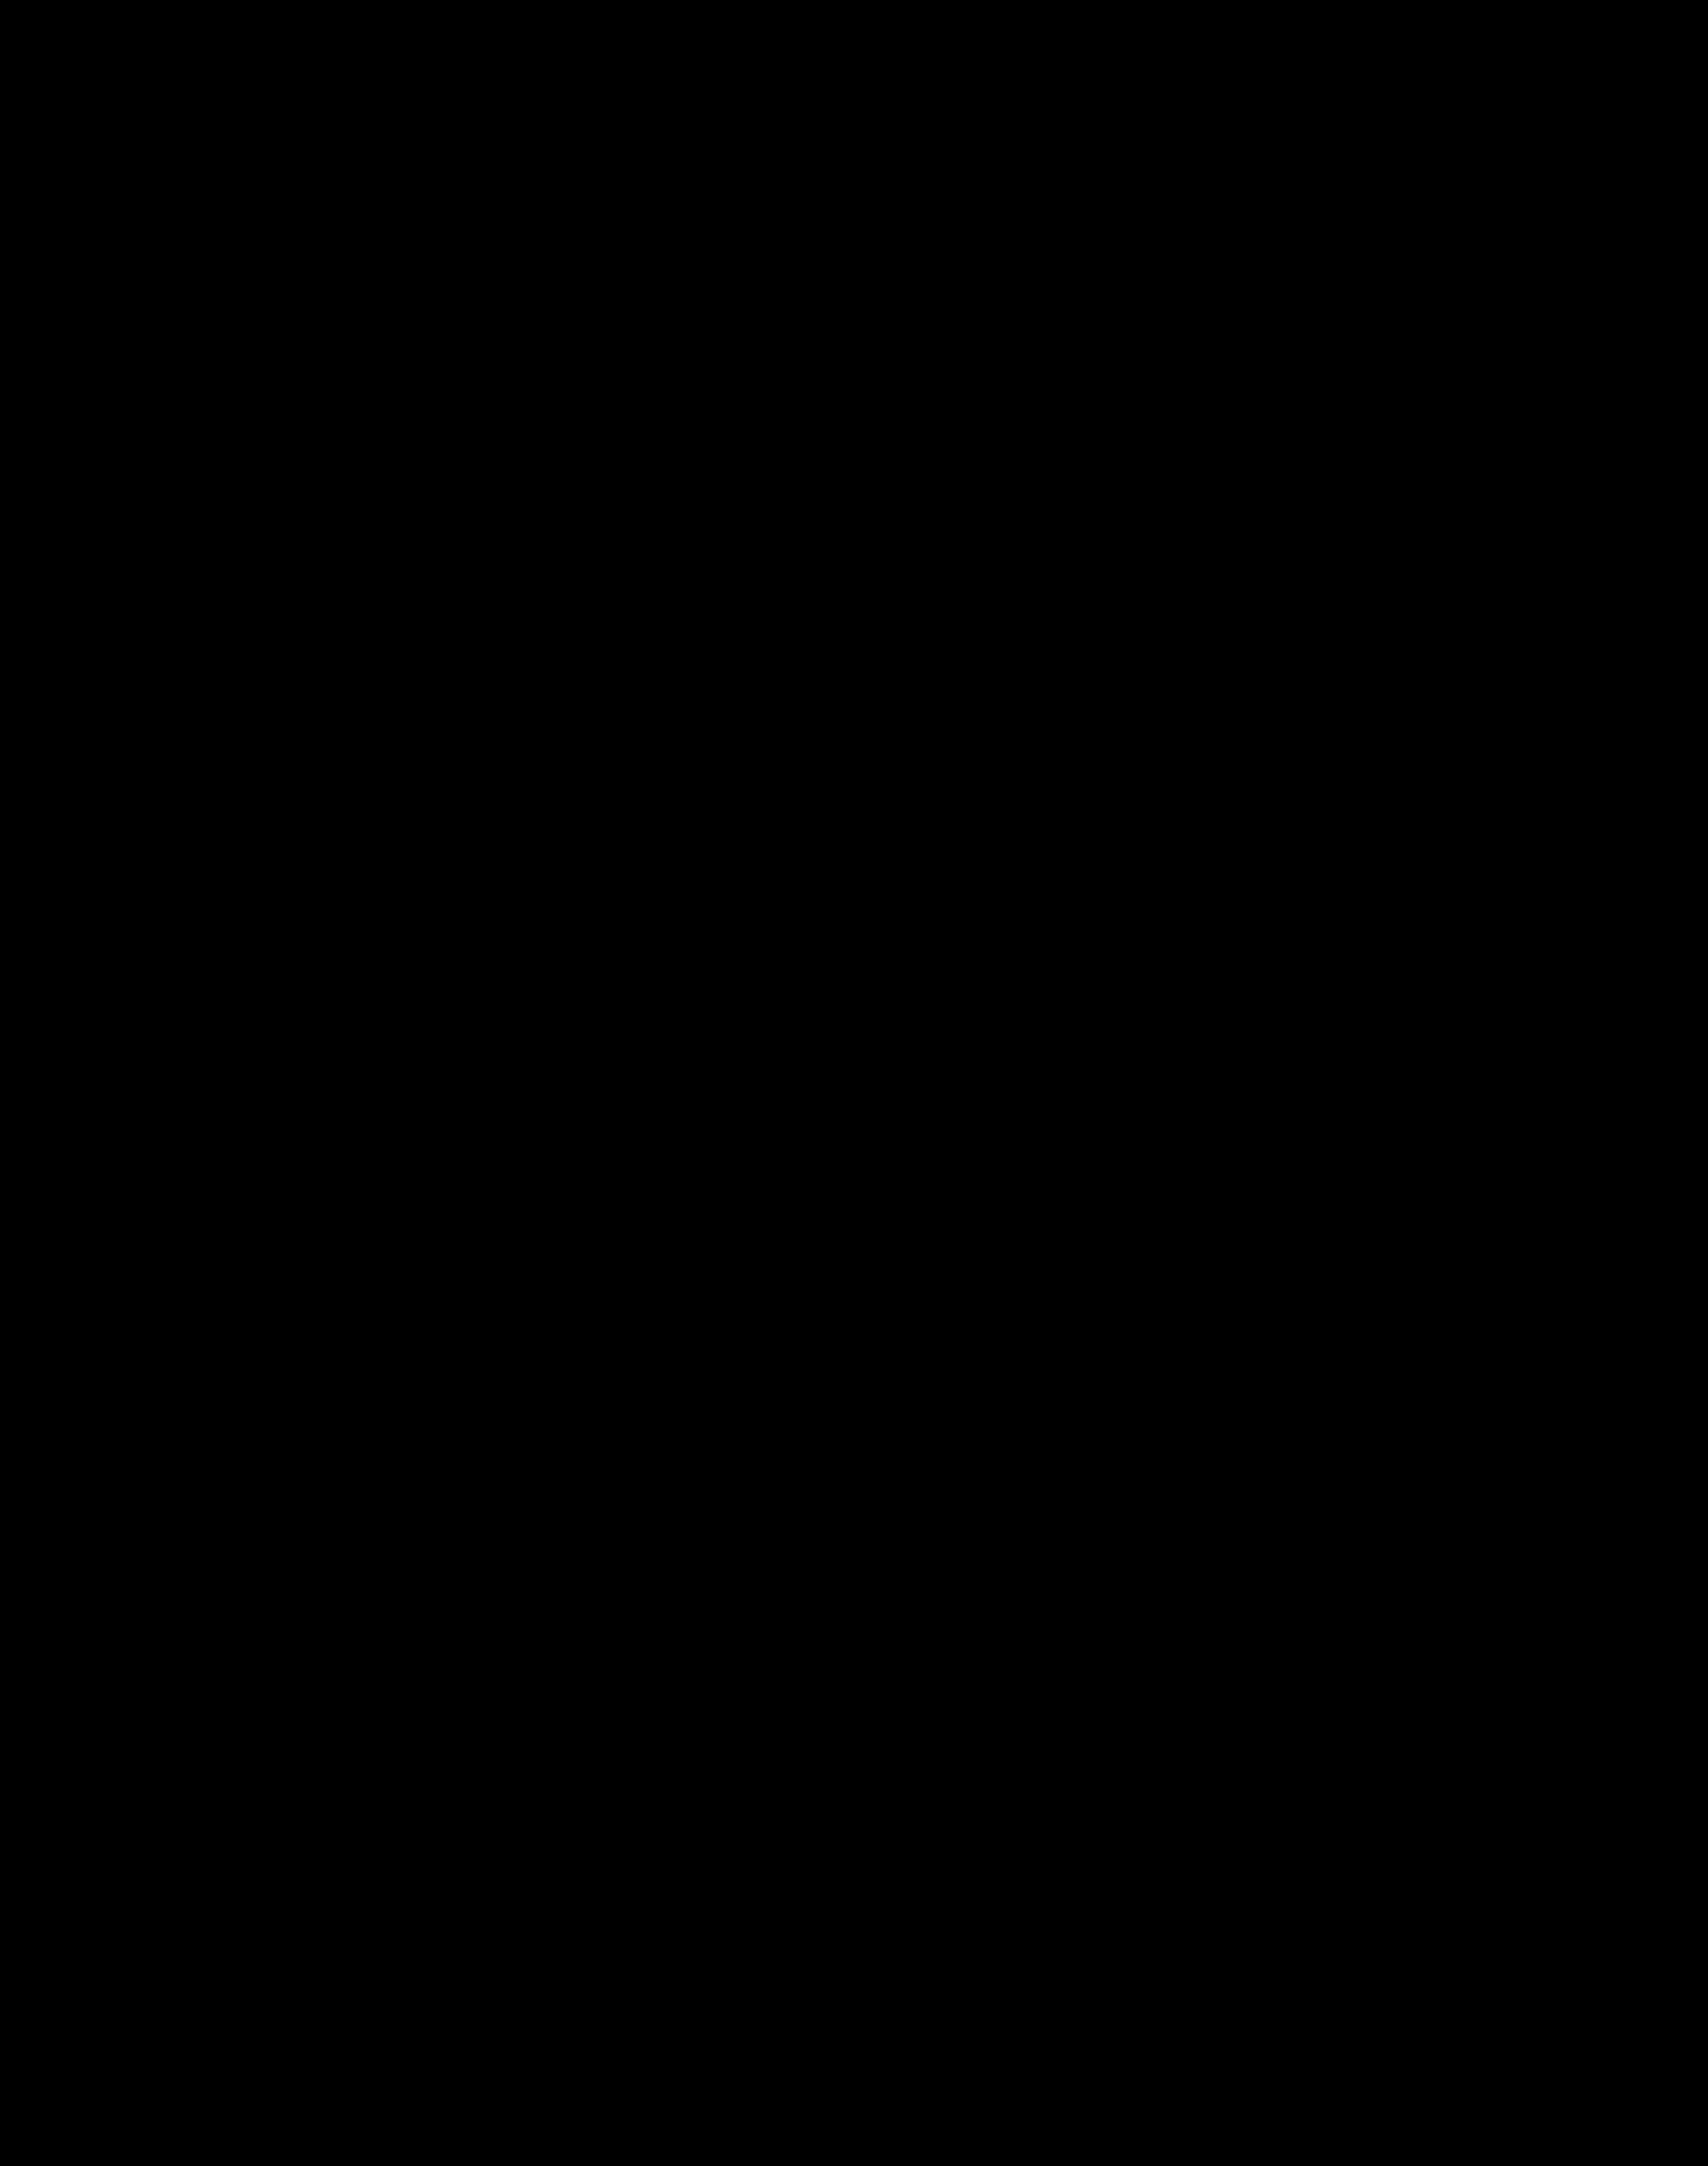 Flying silhouette clip art. Nest clipart crow nest